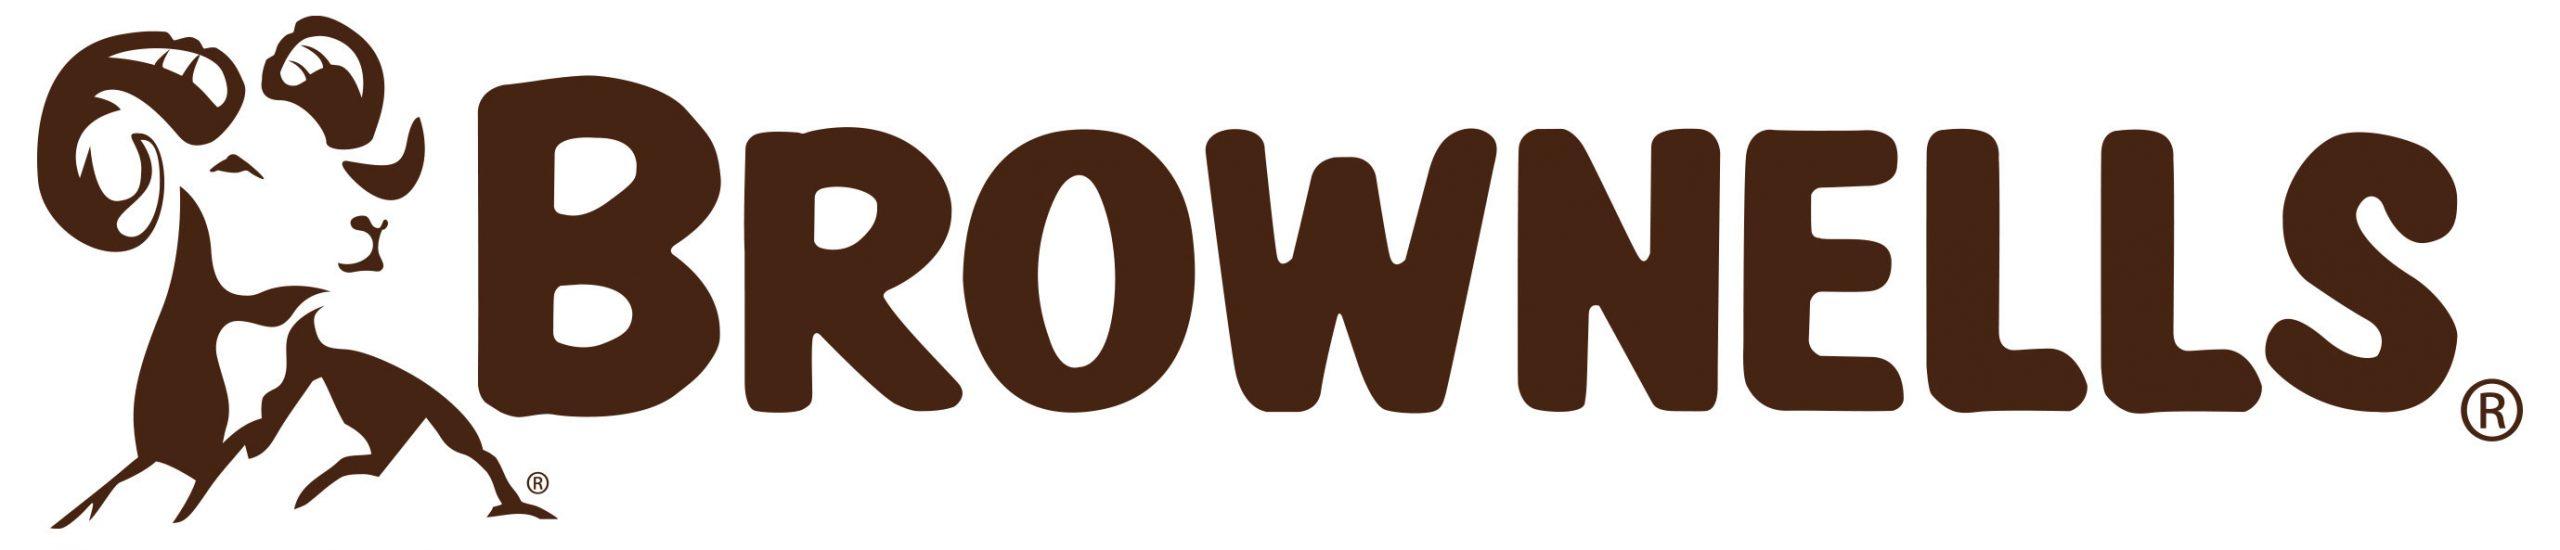 Brownells logo - horizontal